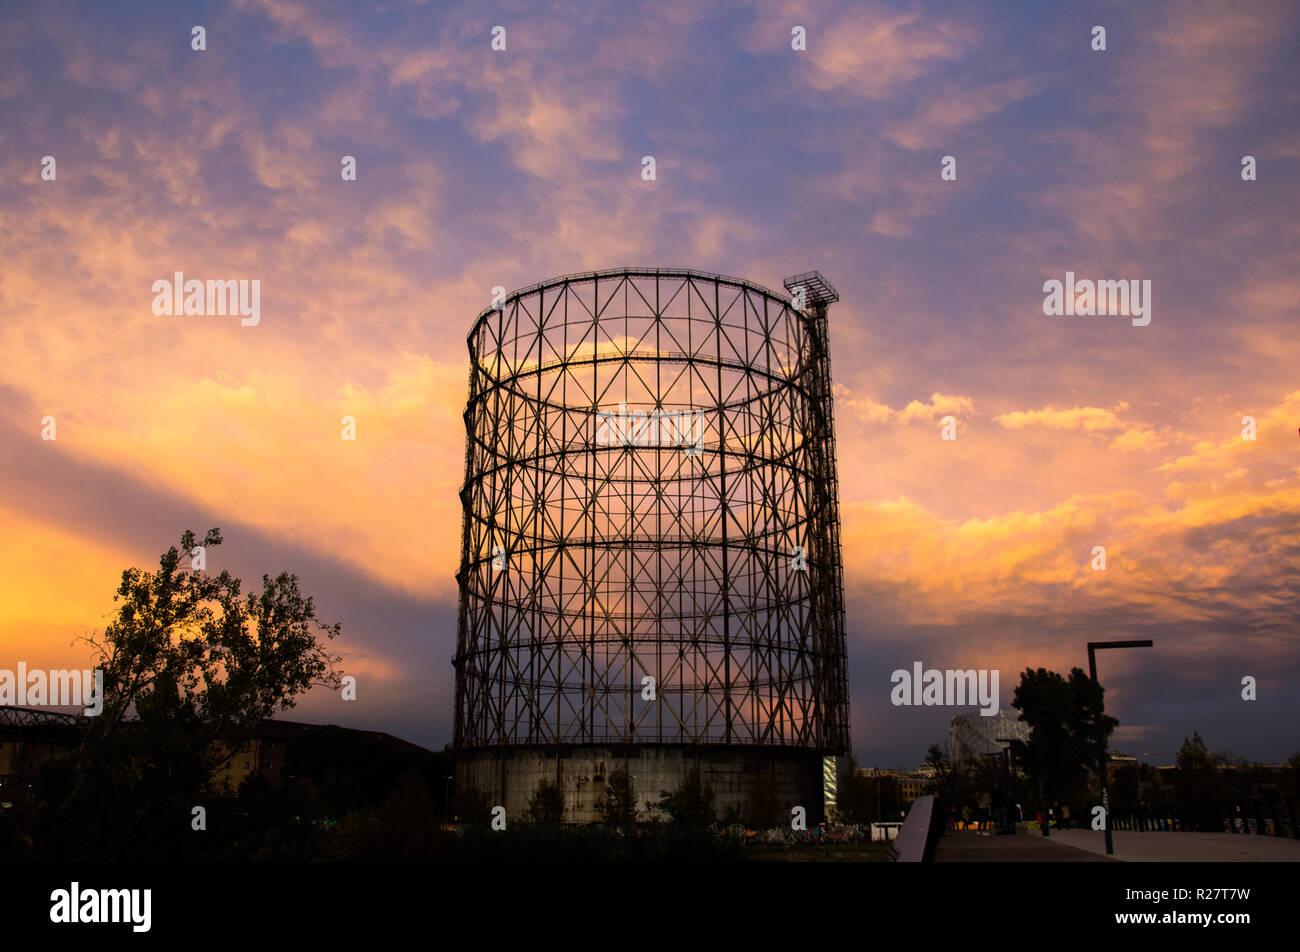 Gazometro View - An urban sunset - Stock Image